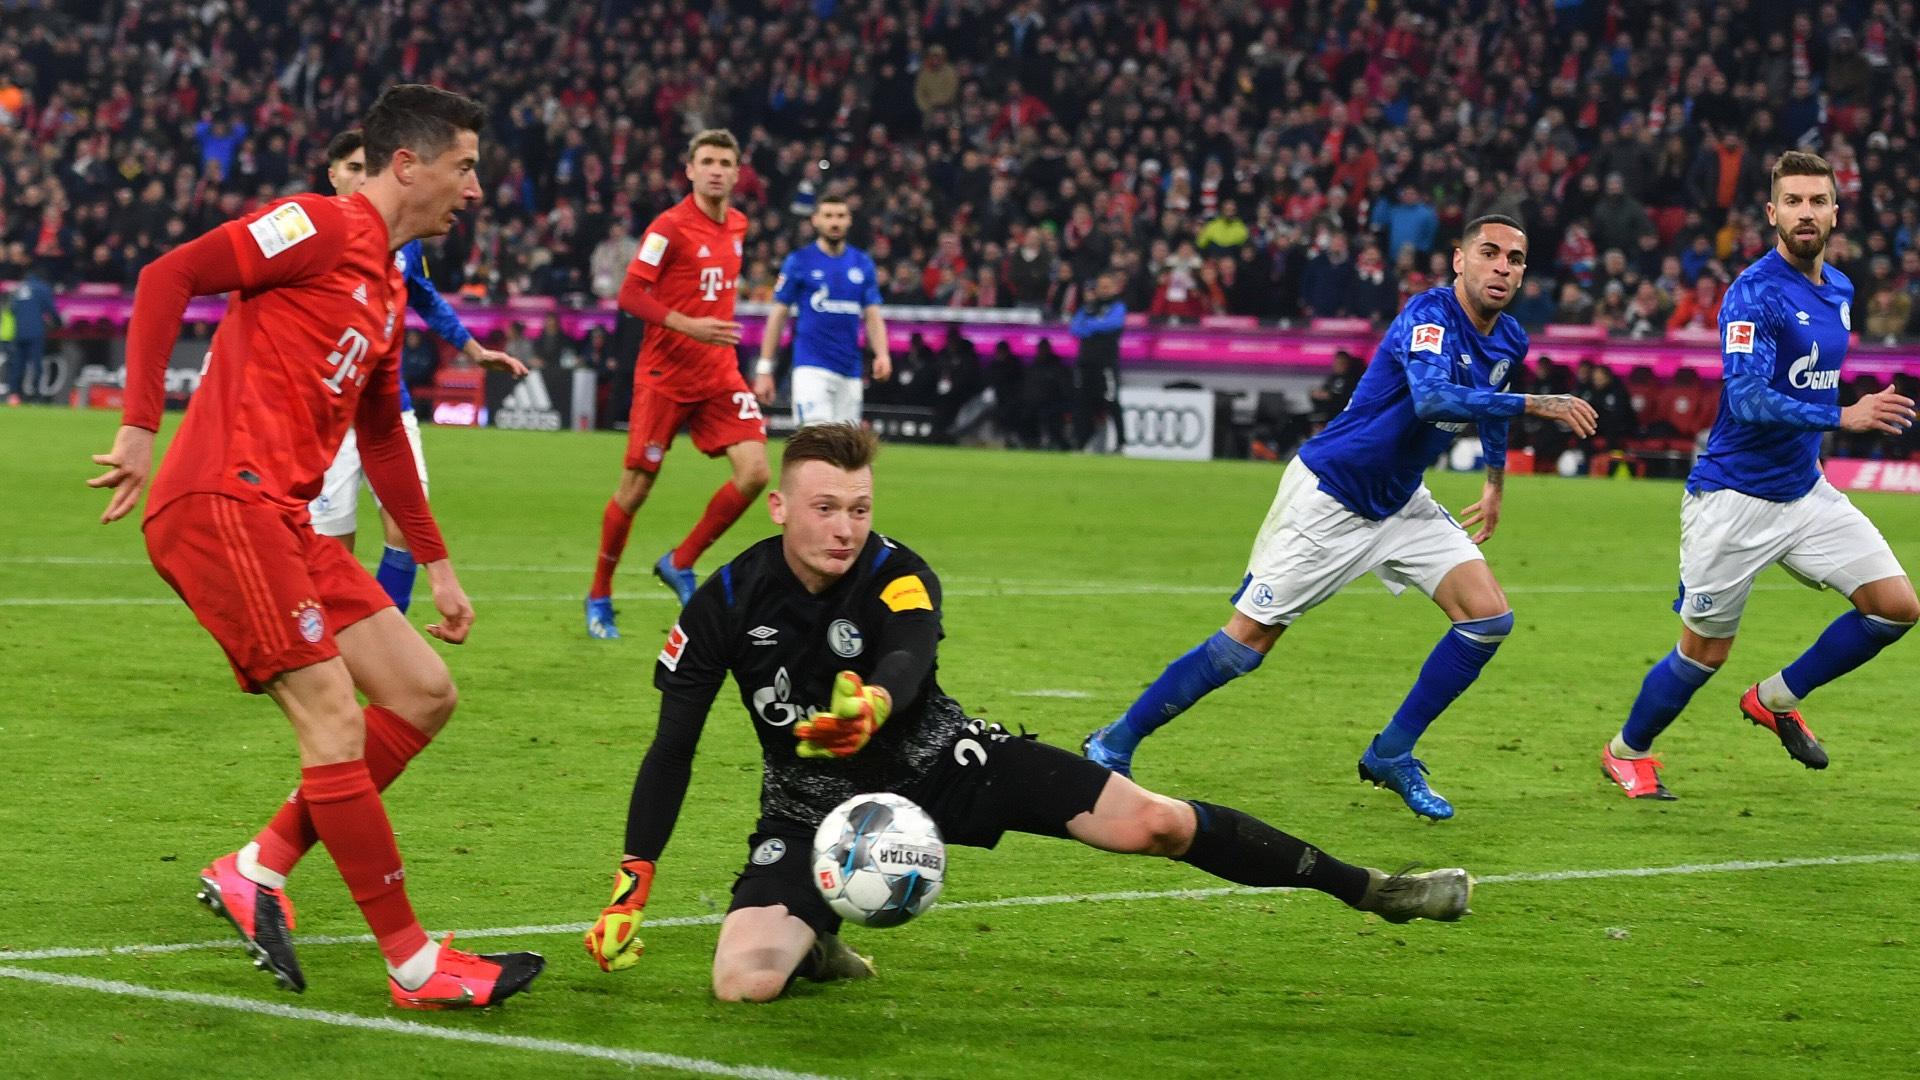 Ergebnisse Der 1. Bundesliga